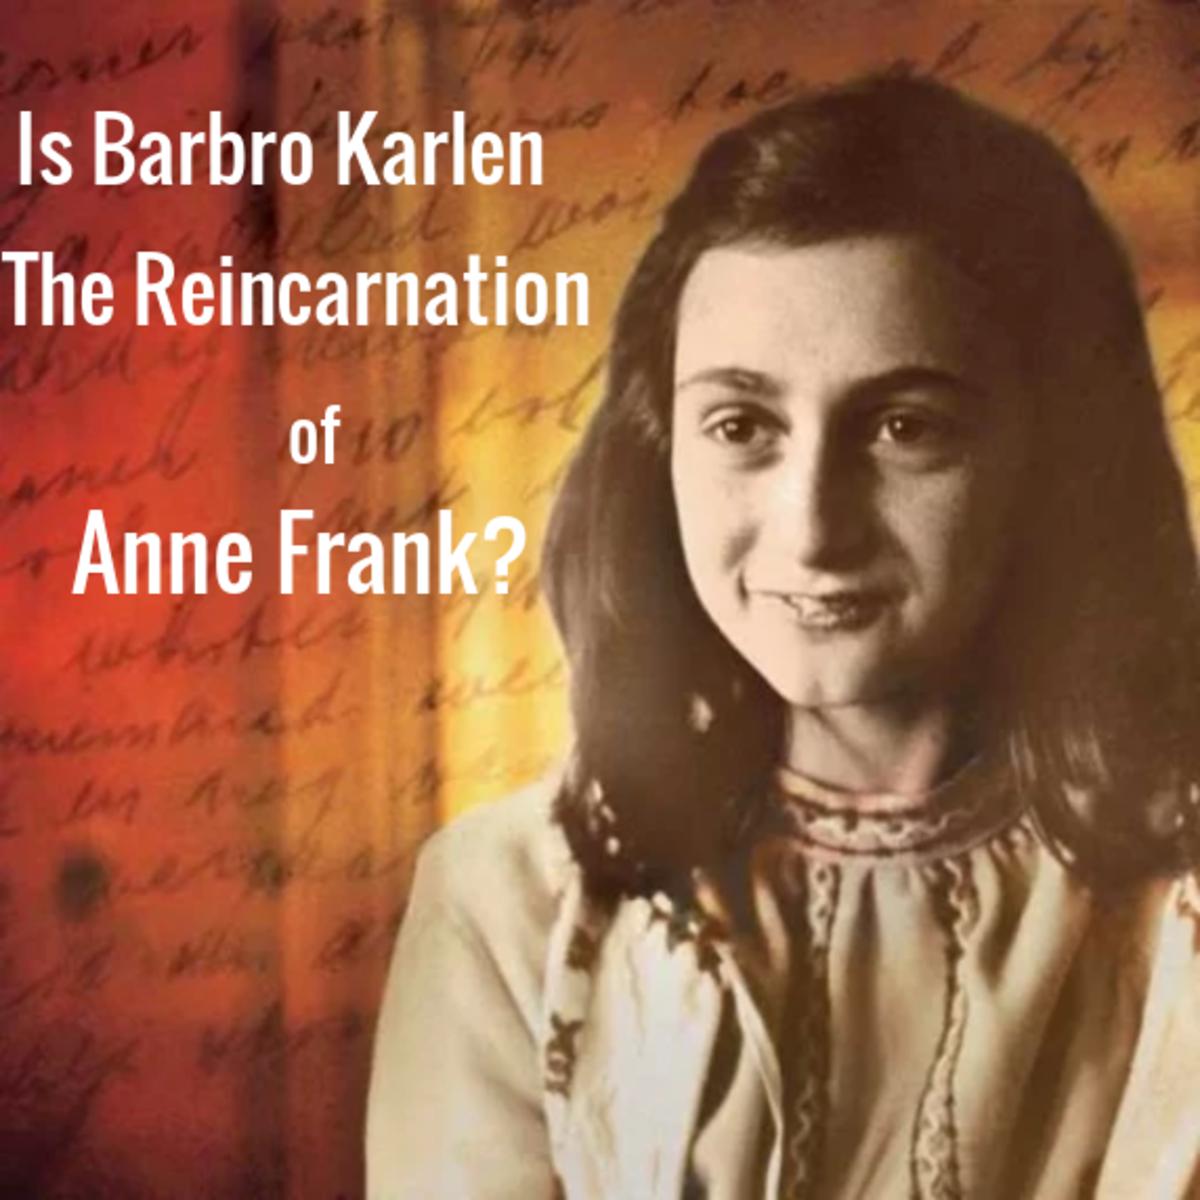 Barbro Karlen #Reincarnation Anne Frank Reincarnation reincarated #BarbroKarlen #AnneFrank